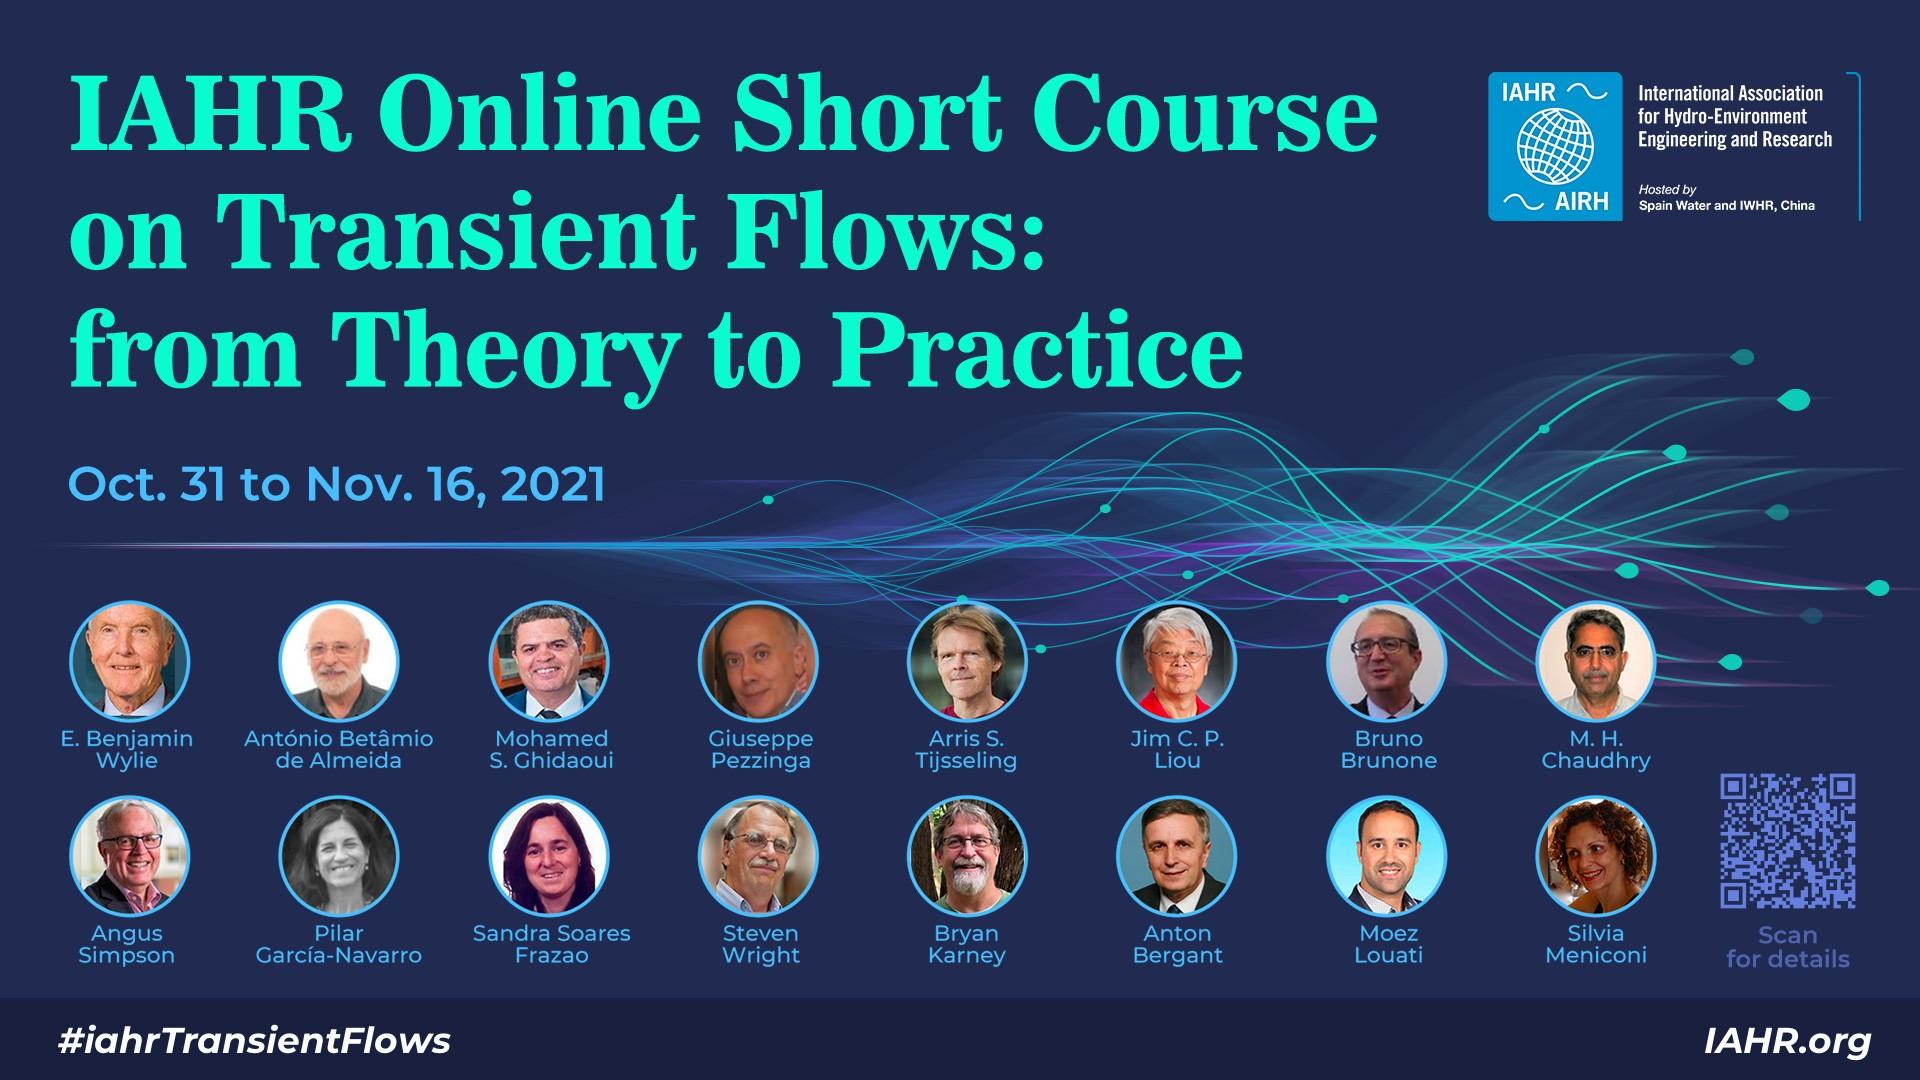 IAHR-Online-Short-Course-on-Transient-Flows-1920-1080-compressed.jpg